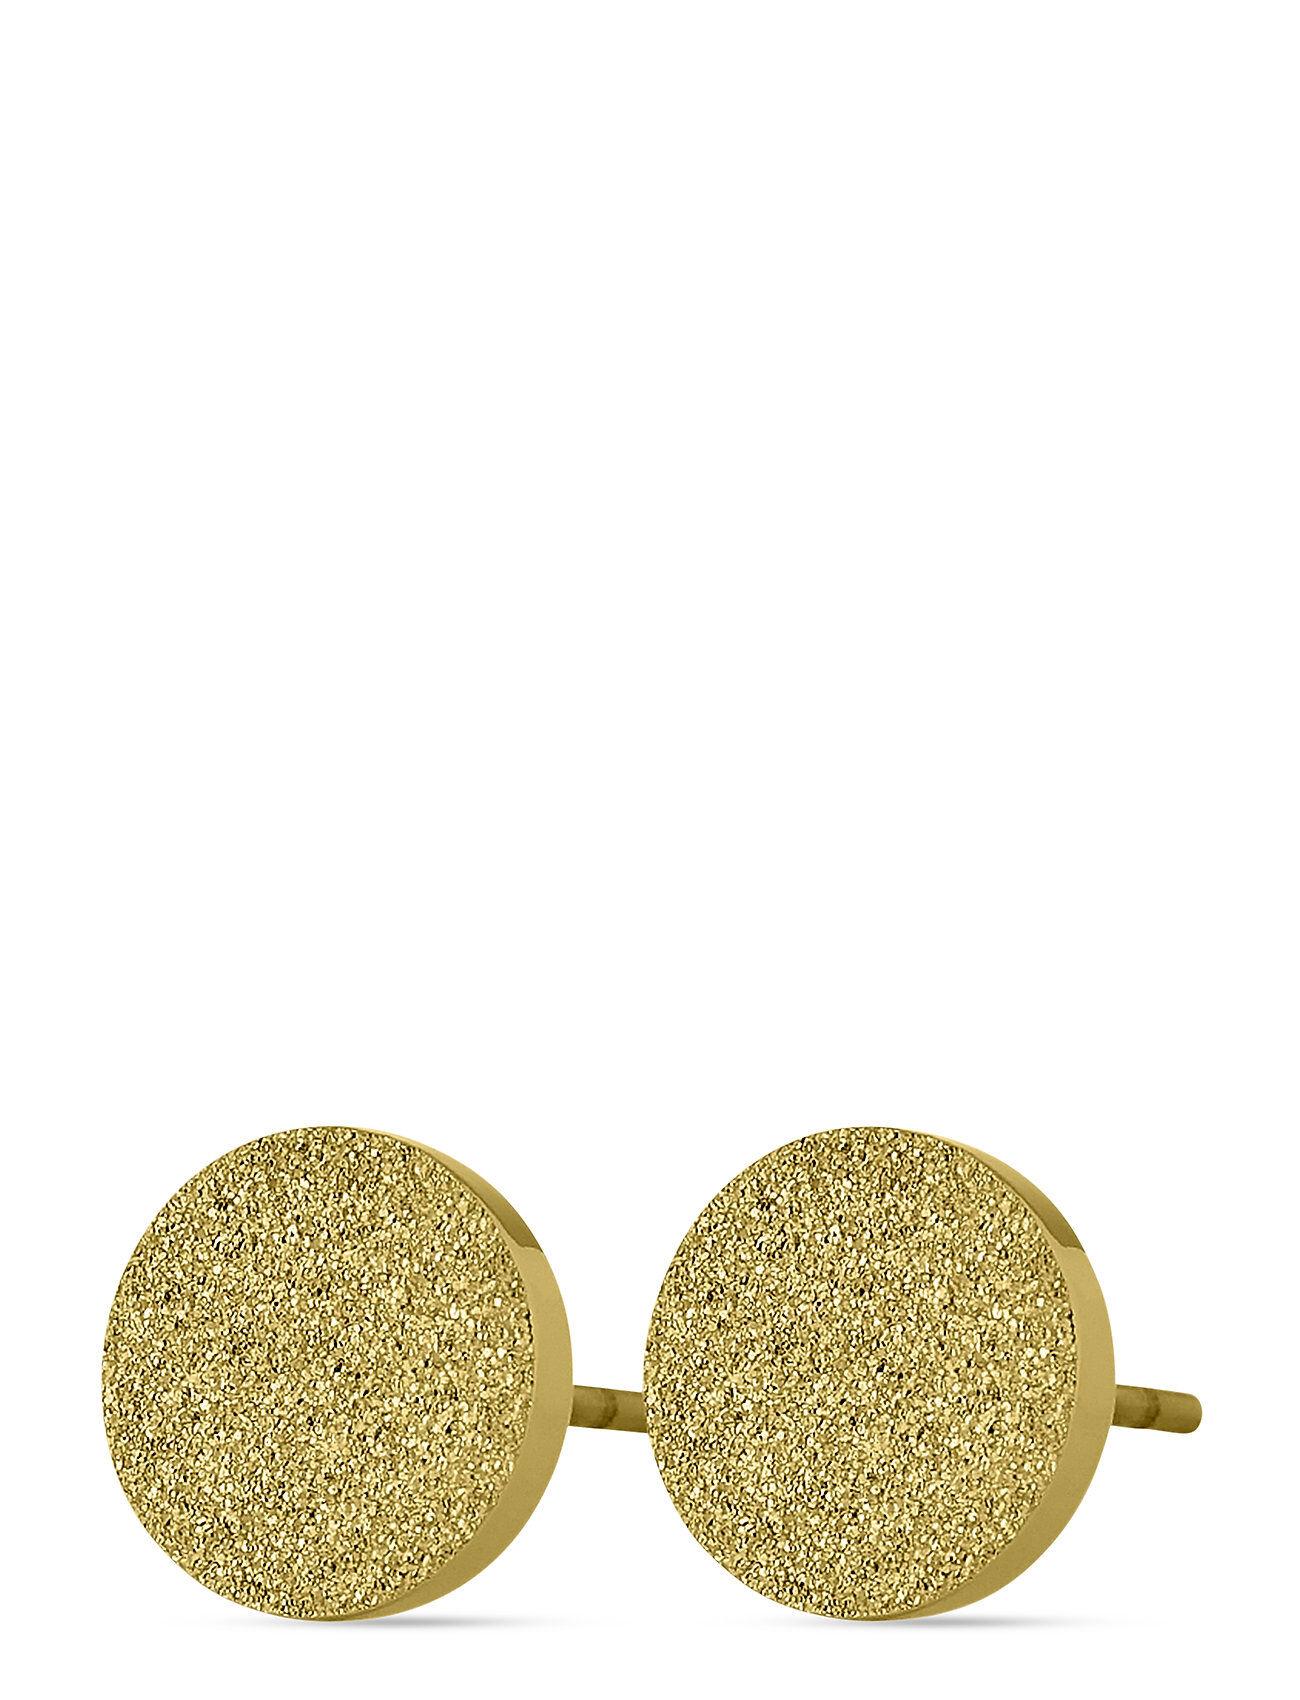 Edblad Dottie Studs Glittering Gold Accessories Jewellery Earrings Studs Kulta Edblad